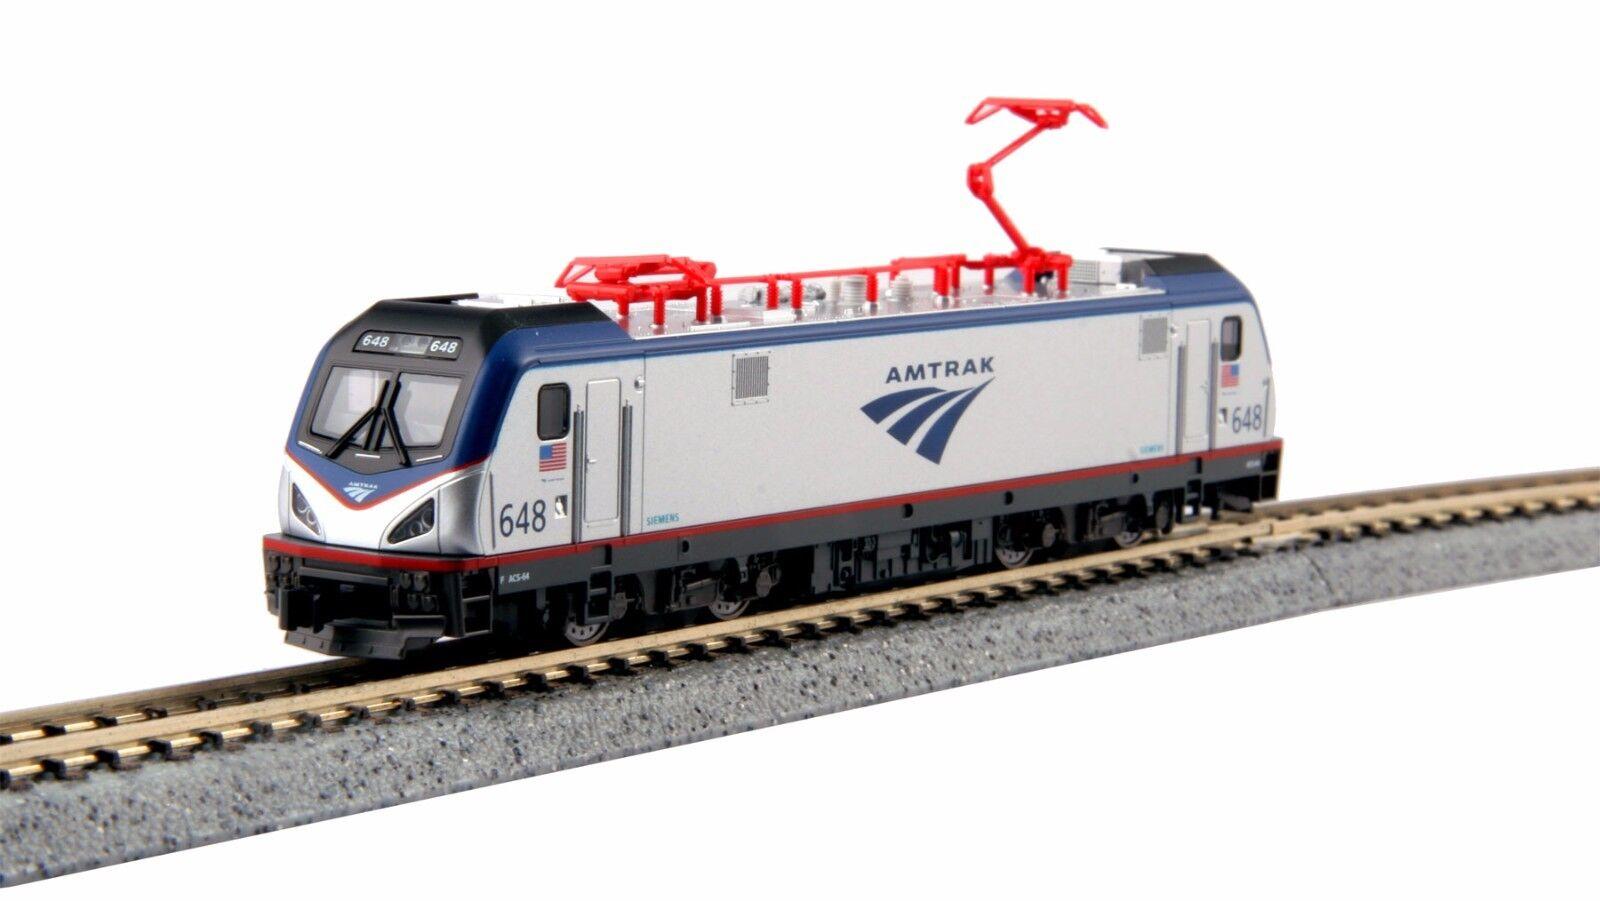 KATO 1373003 N SCALE ACS-64 Amtrak 648 Electric SIEMENS CITY SPRINTER 137-3003